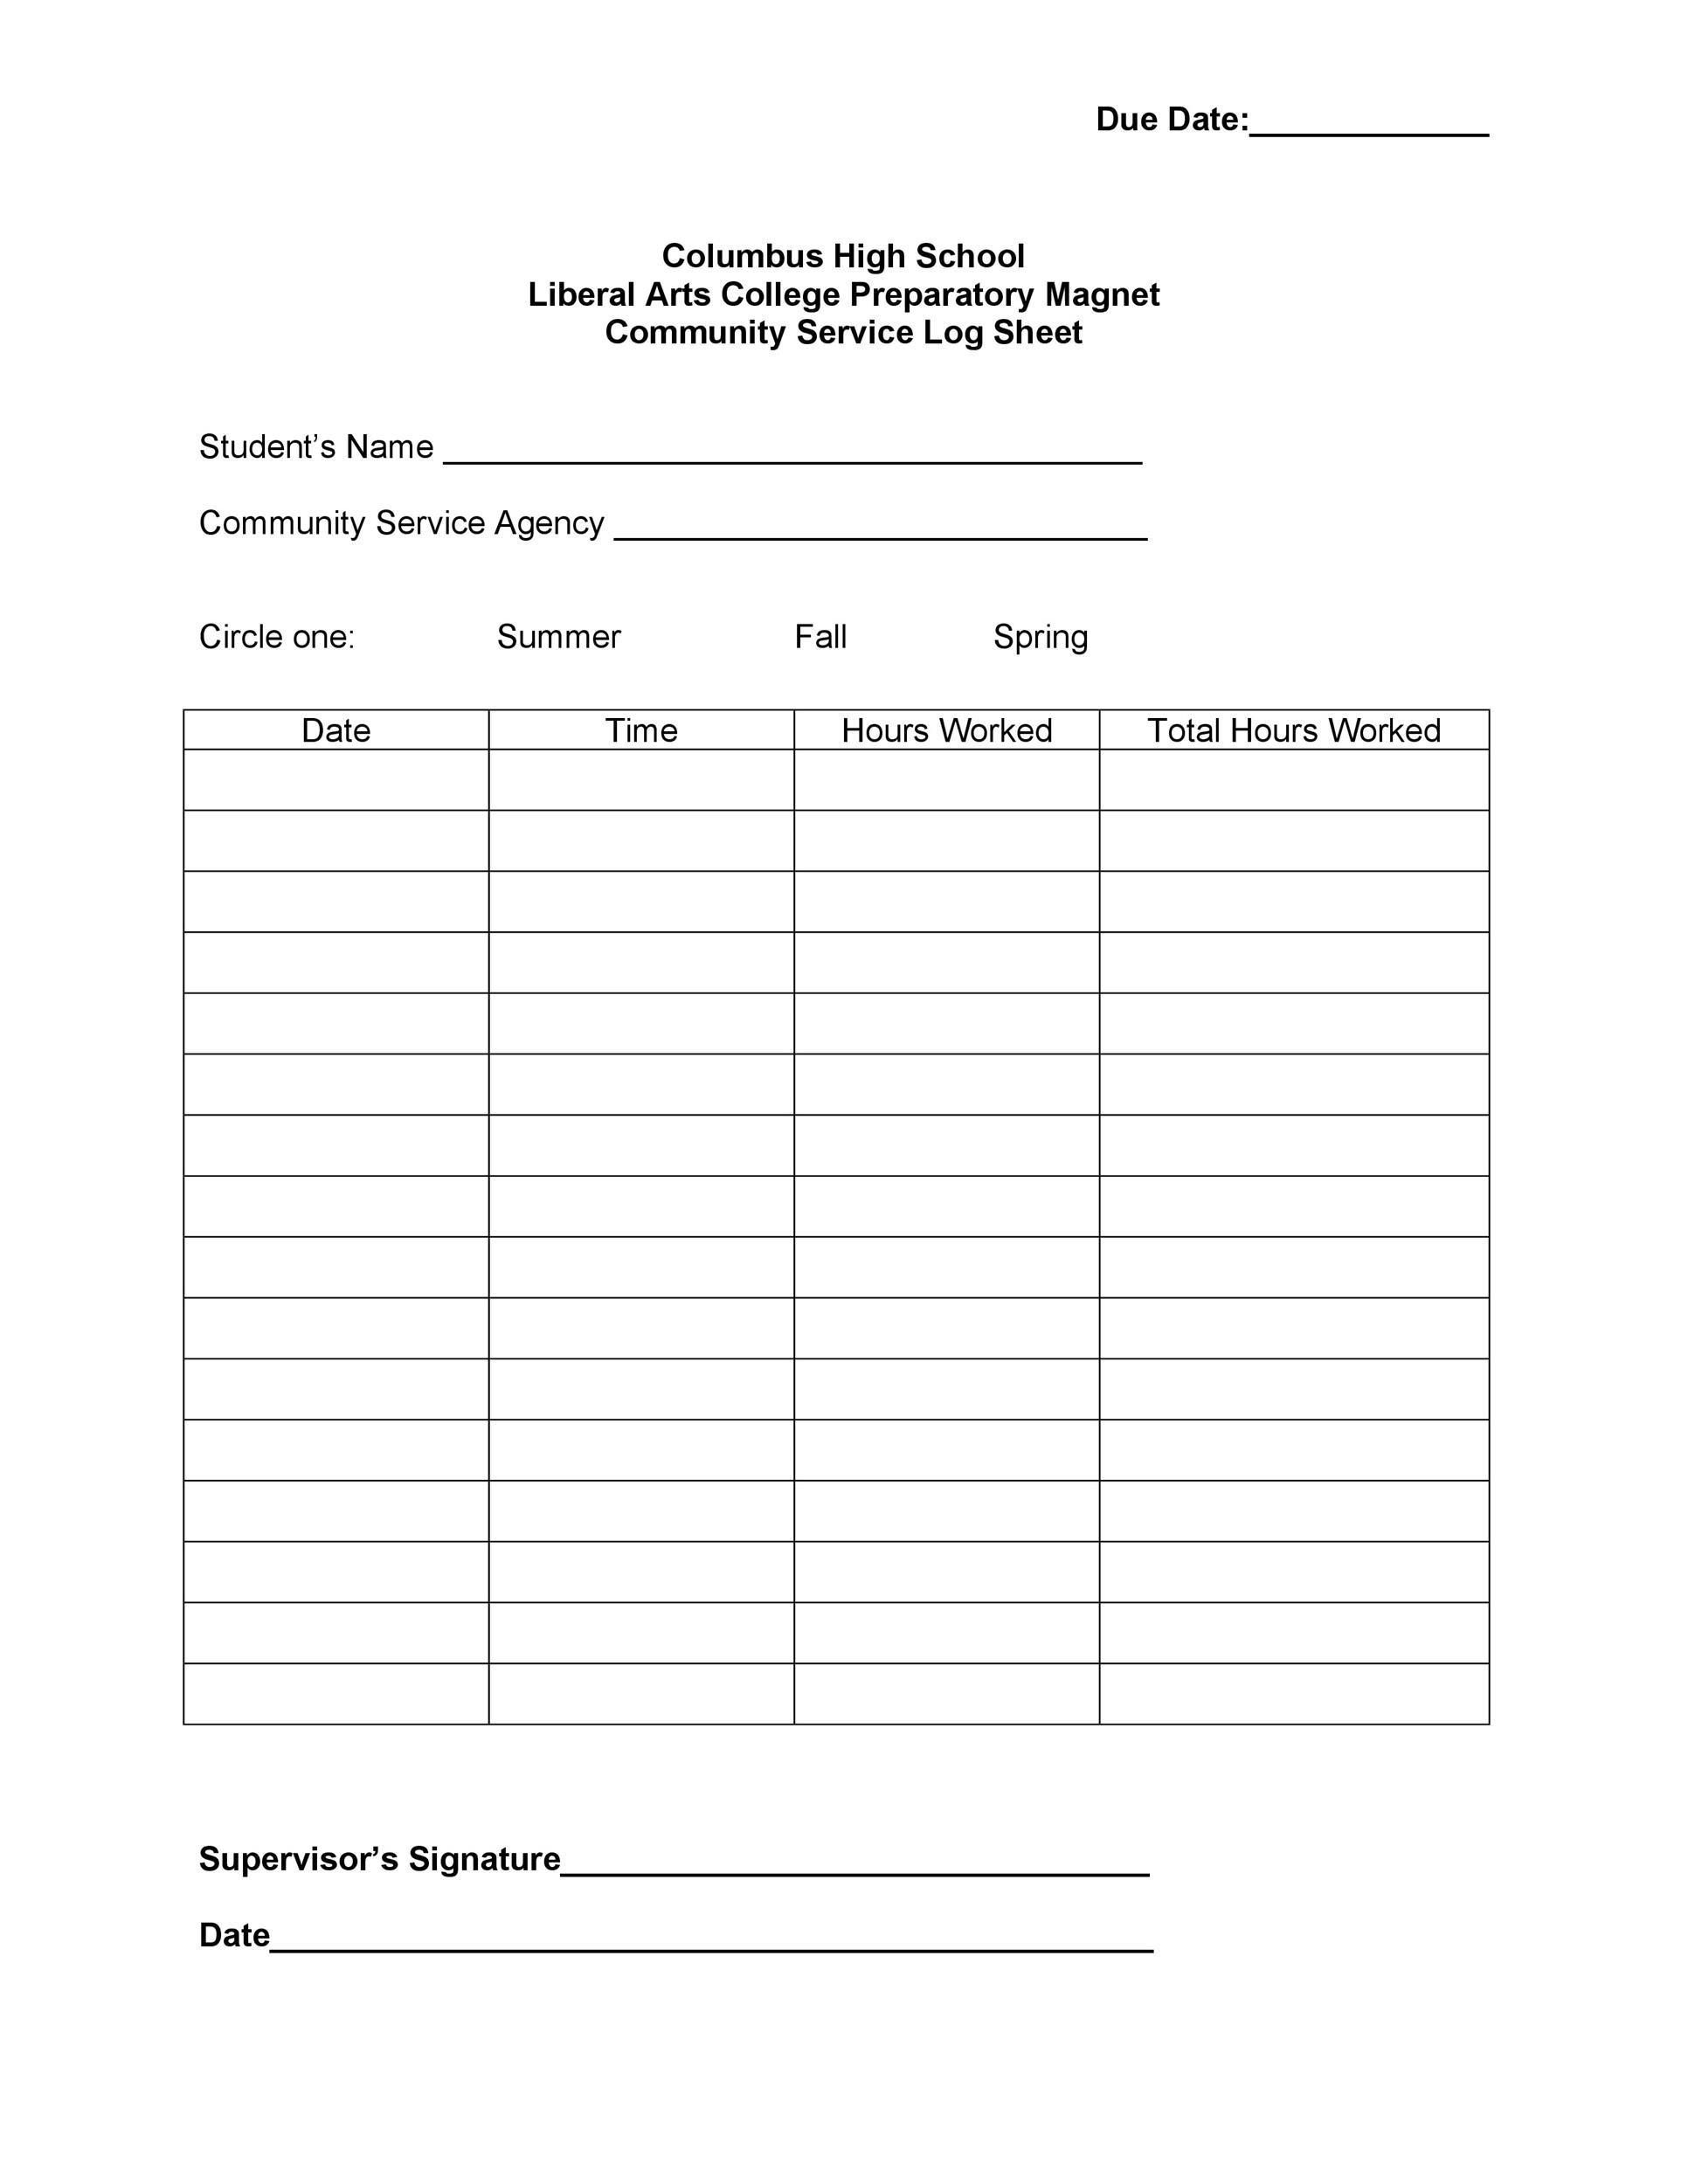 image relating to Free Printable Community Service Log Sheet named 50 Printable Log Sheet Templates [Guide Down load] ᐅ